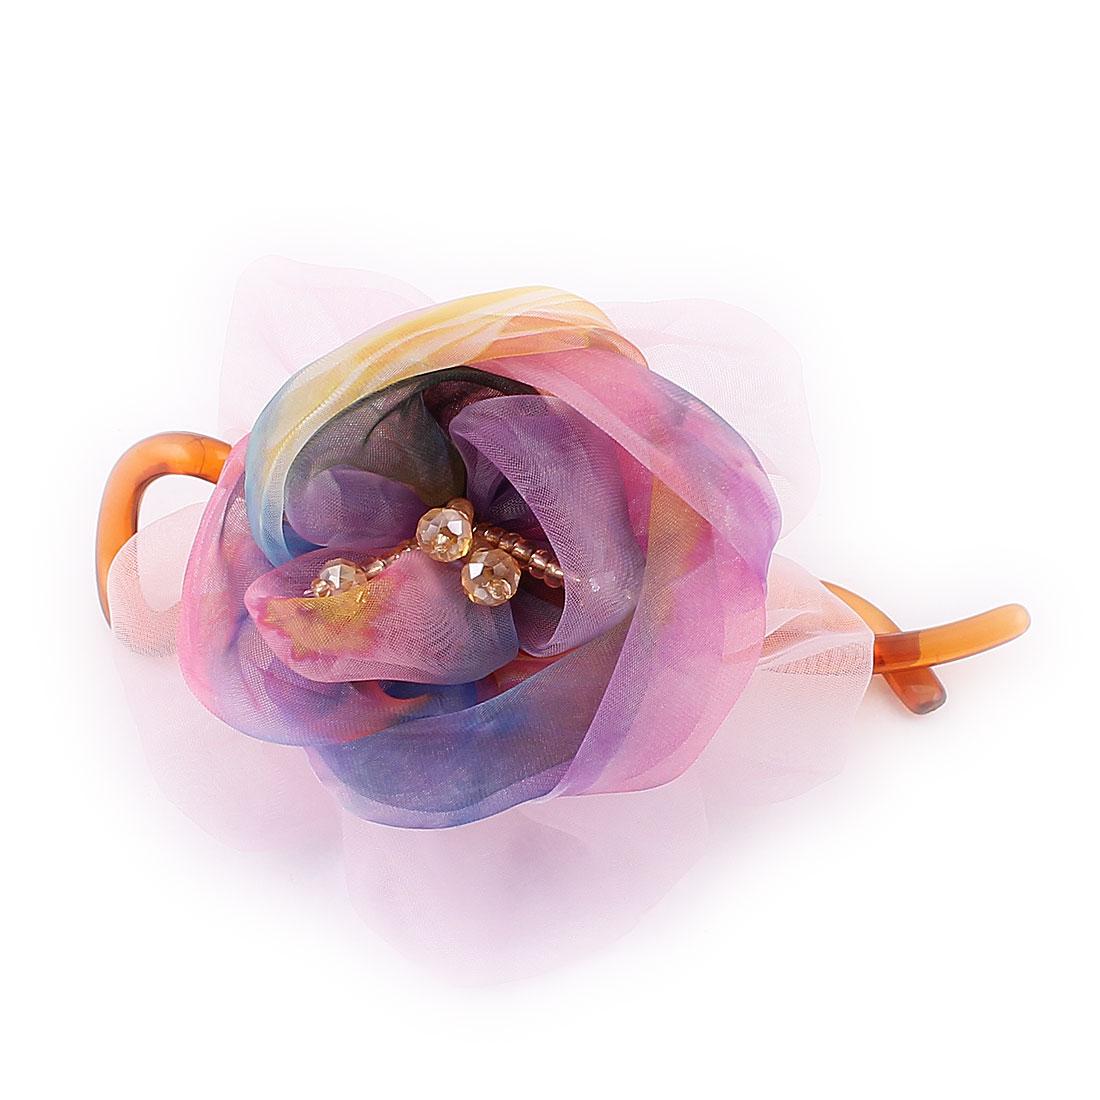 Faux Rhinestone Bead Decor Flower Twisted Banana Hair Clip Claw Light Purple